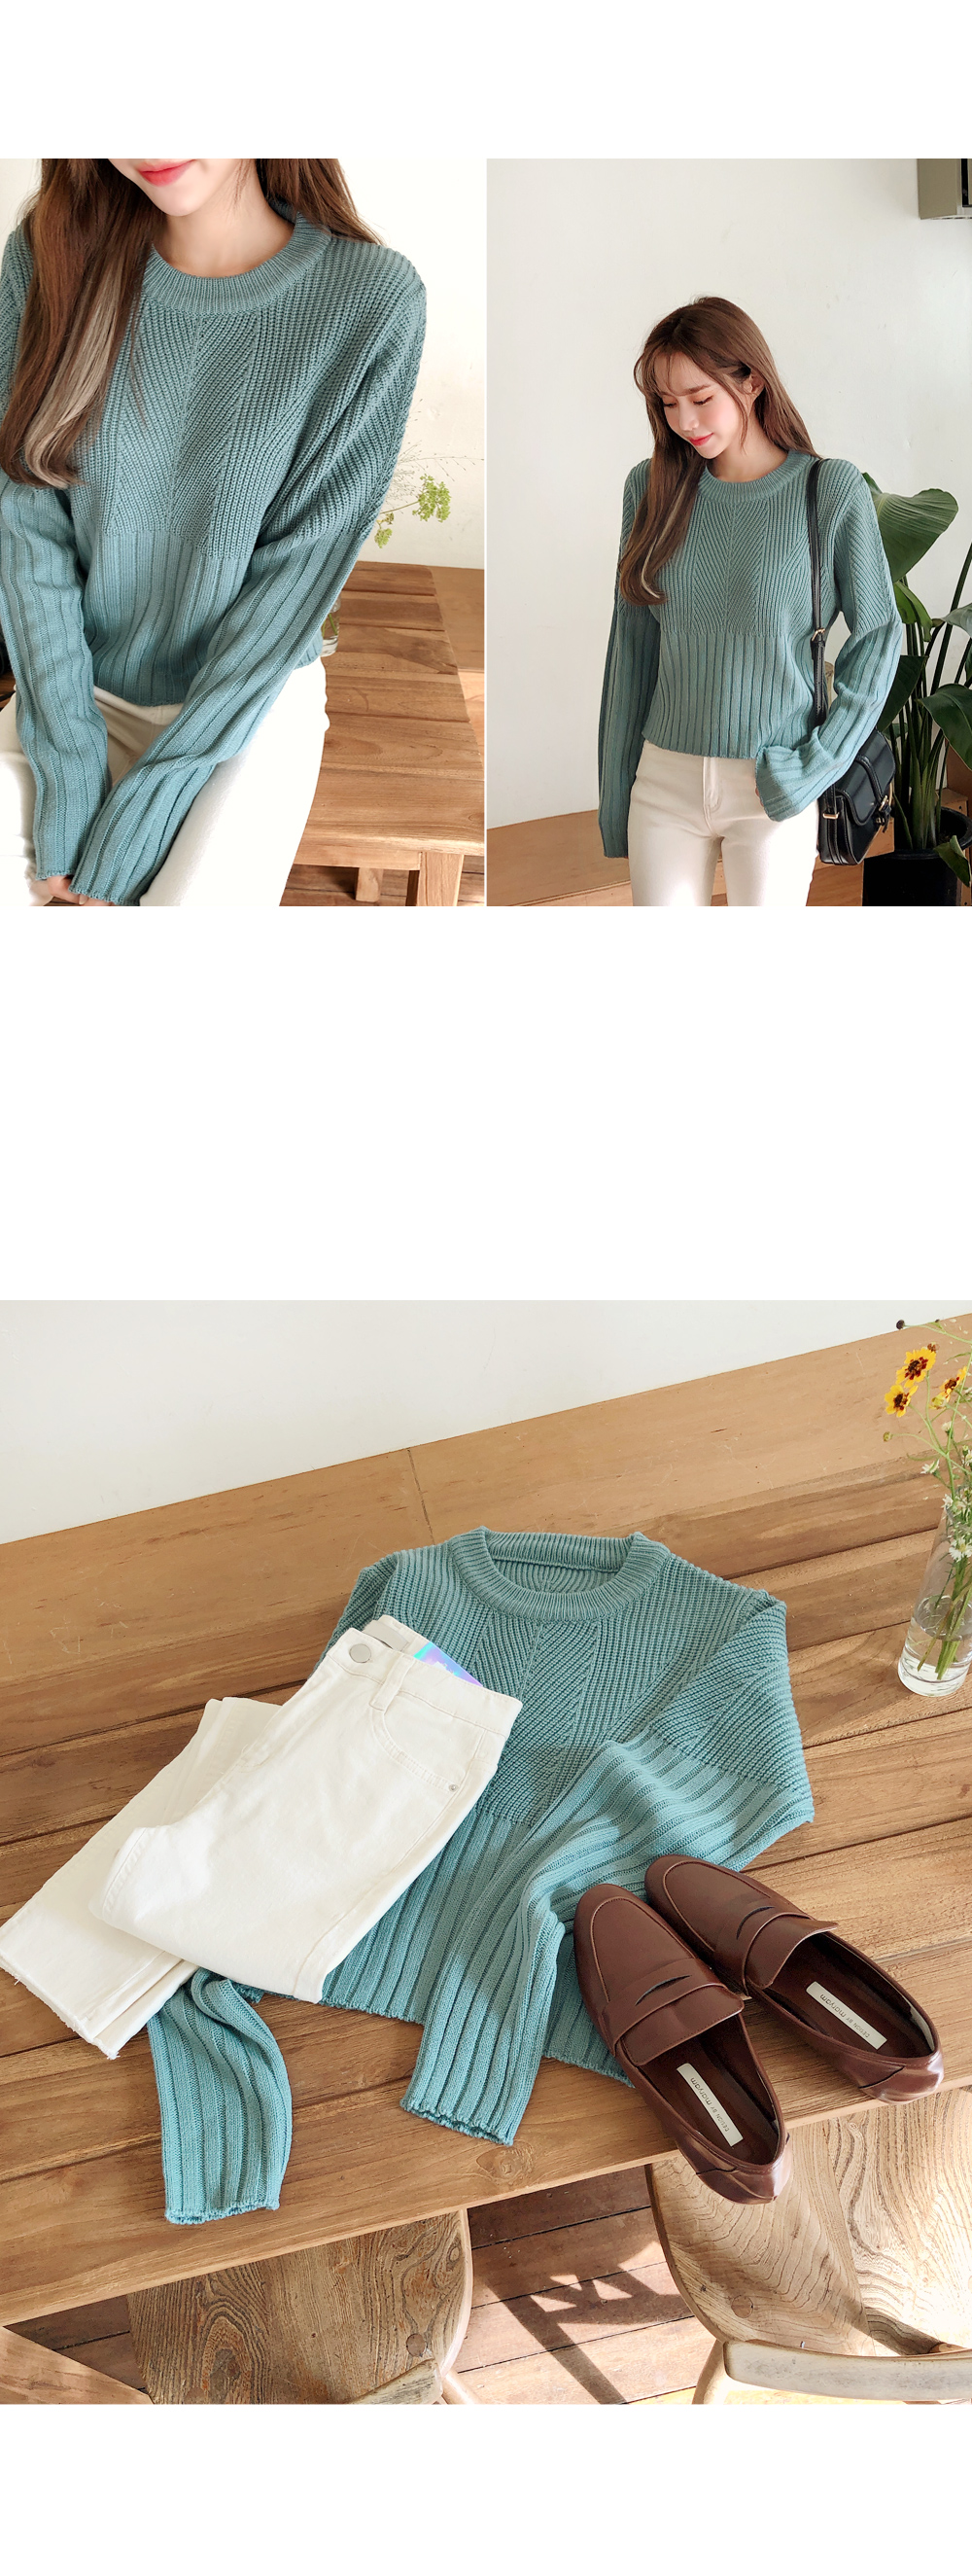 Round Style Knit